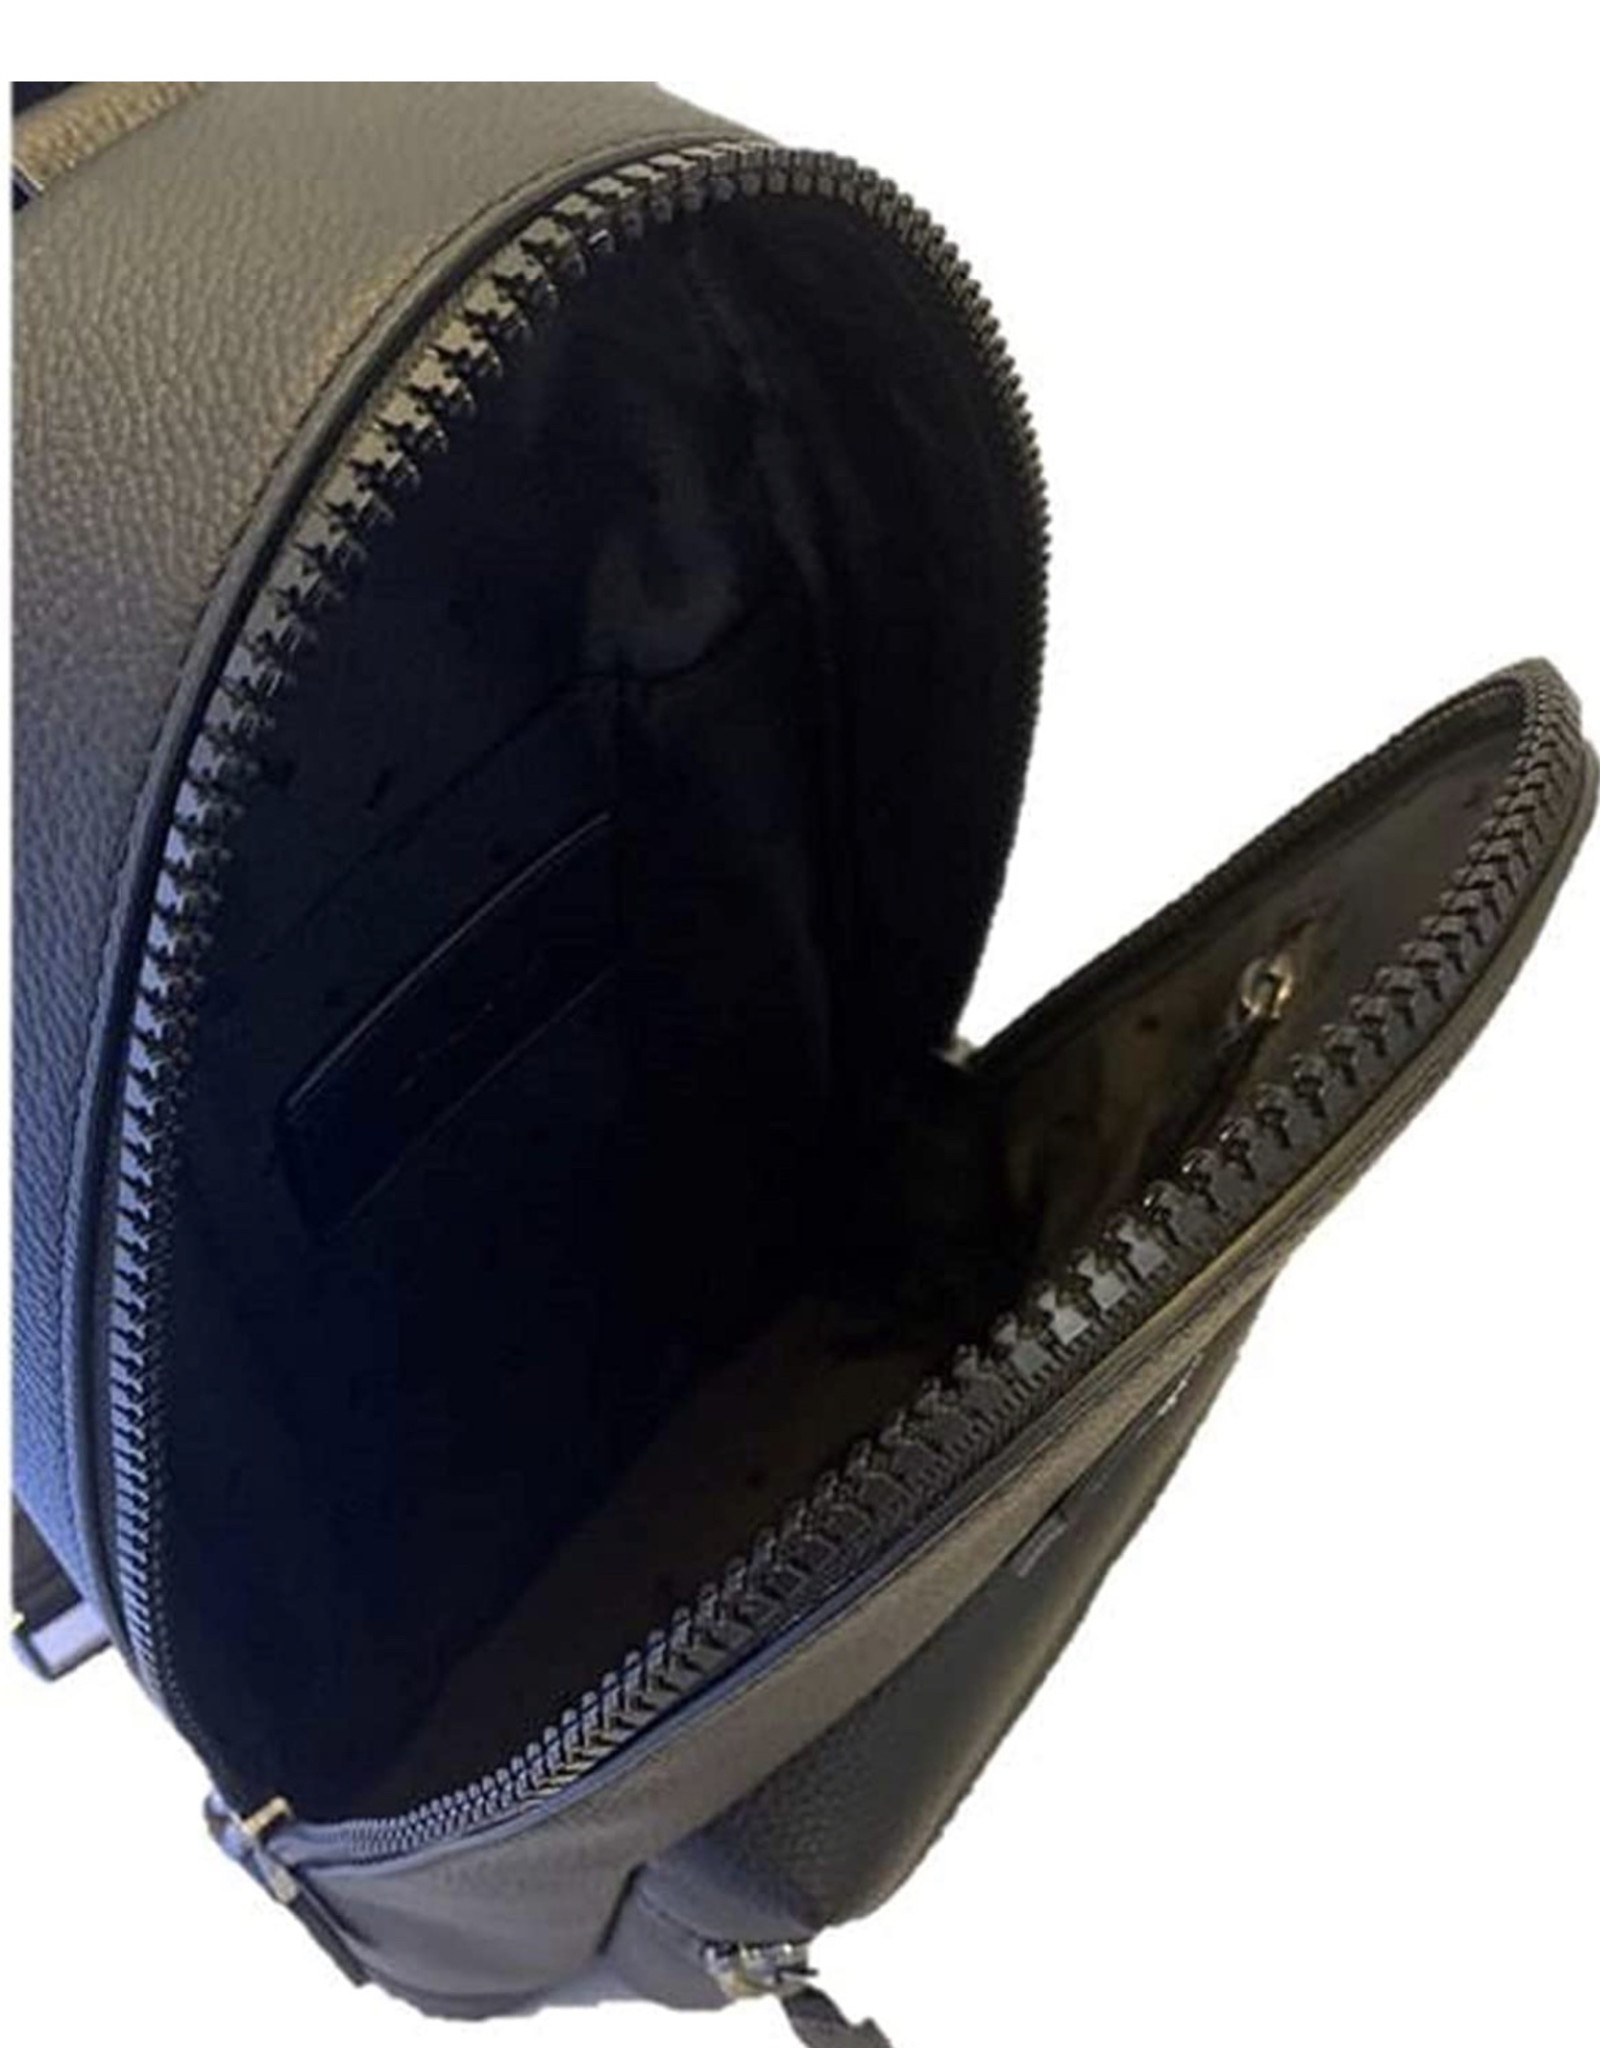 Michael Kors Michael Kors Slingpack Leather Cooper